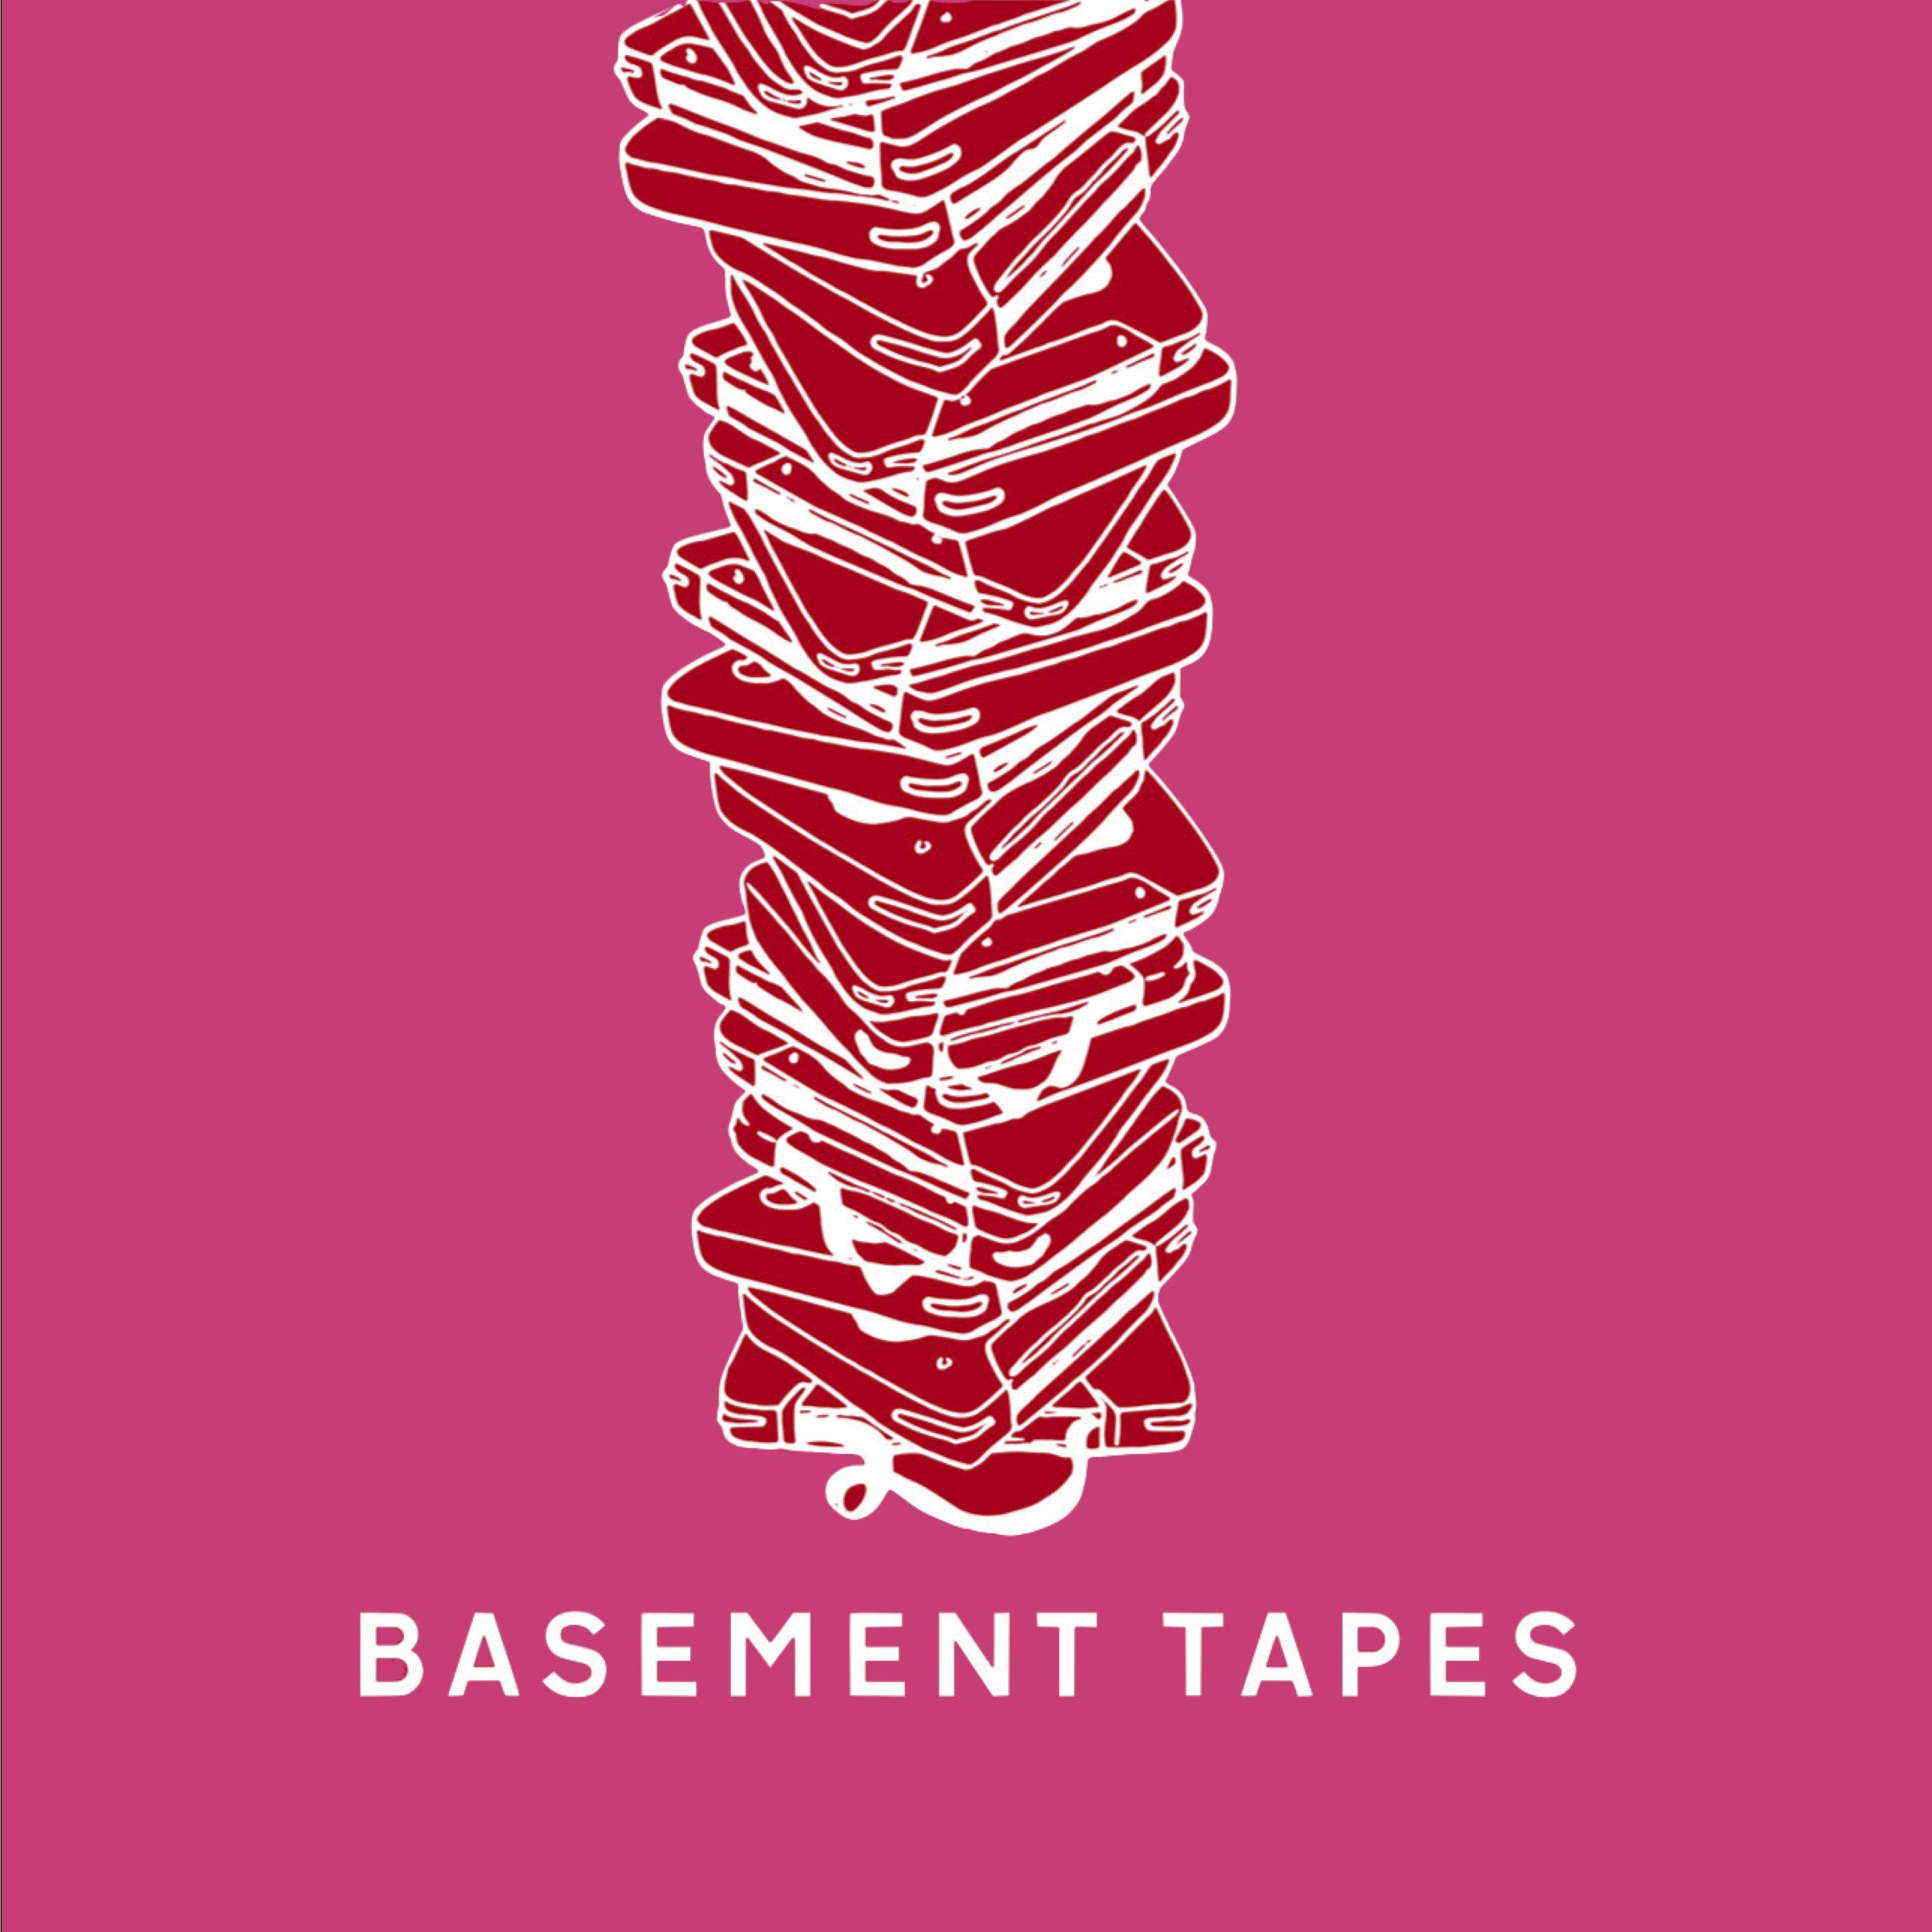 85090bcd59235e Basement Tapes with Kourosh Kanani